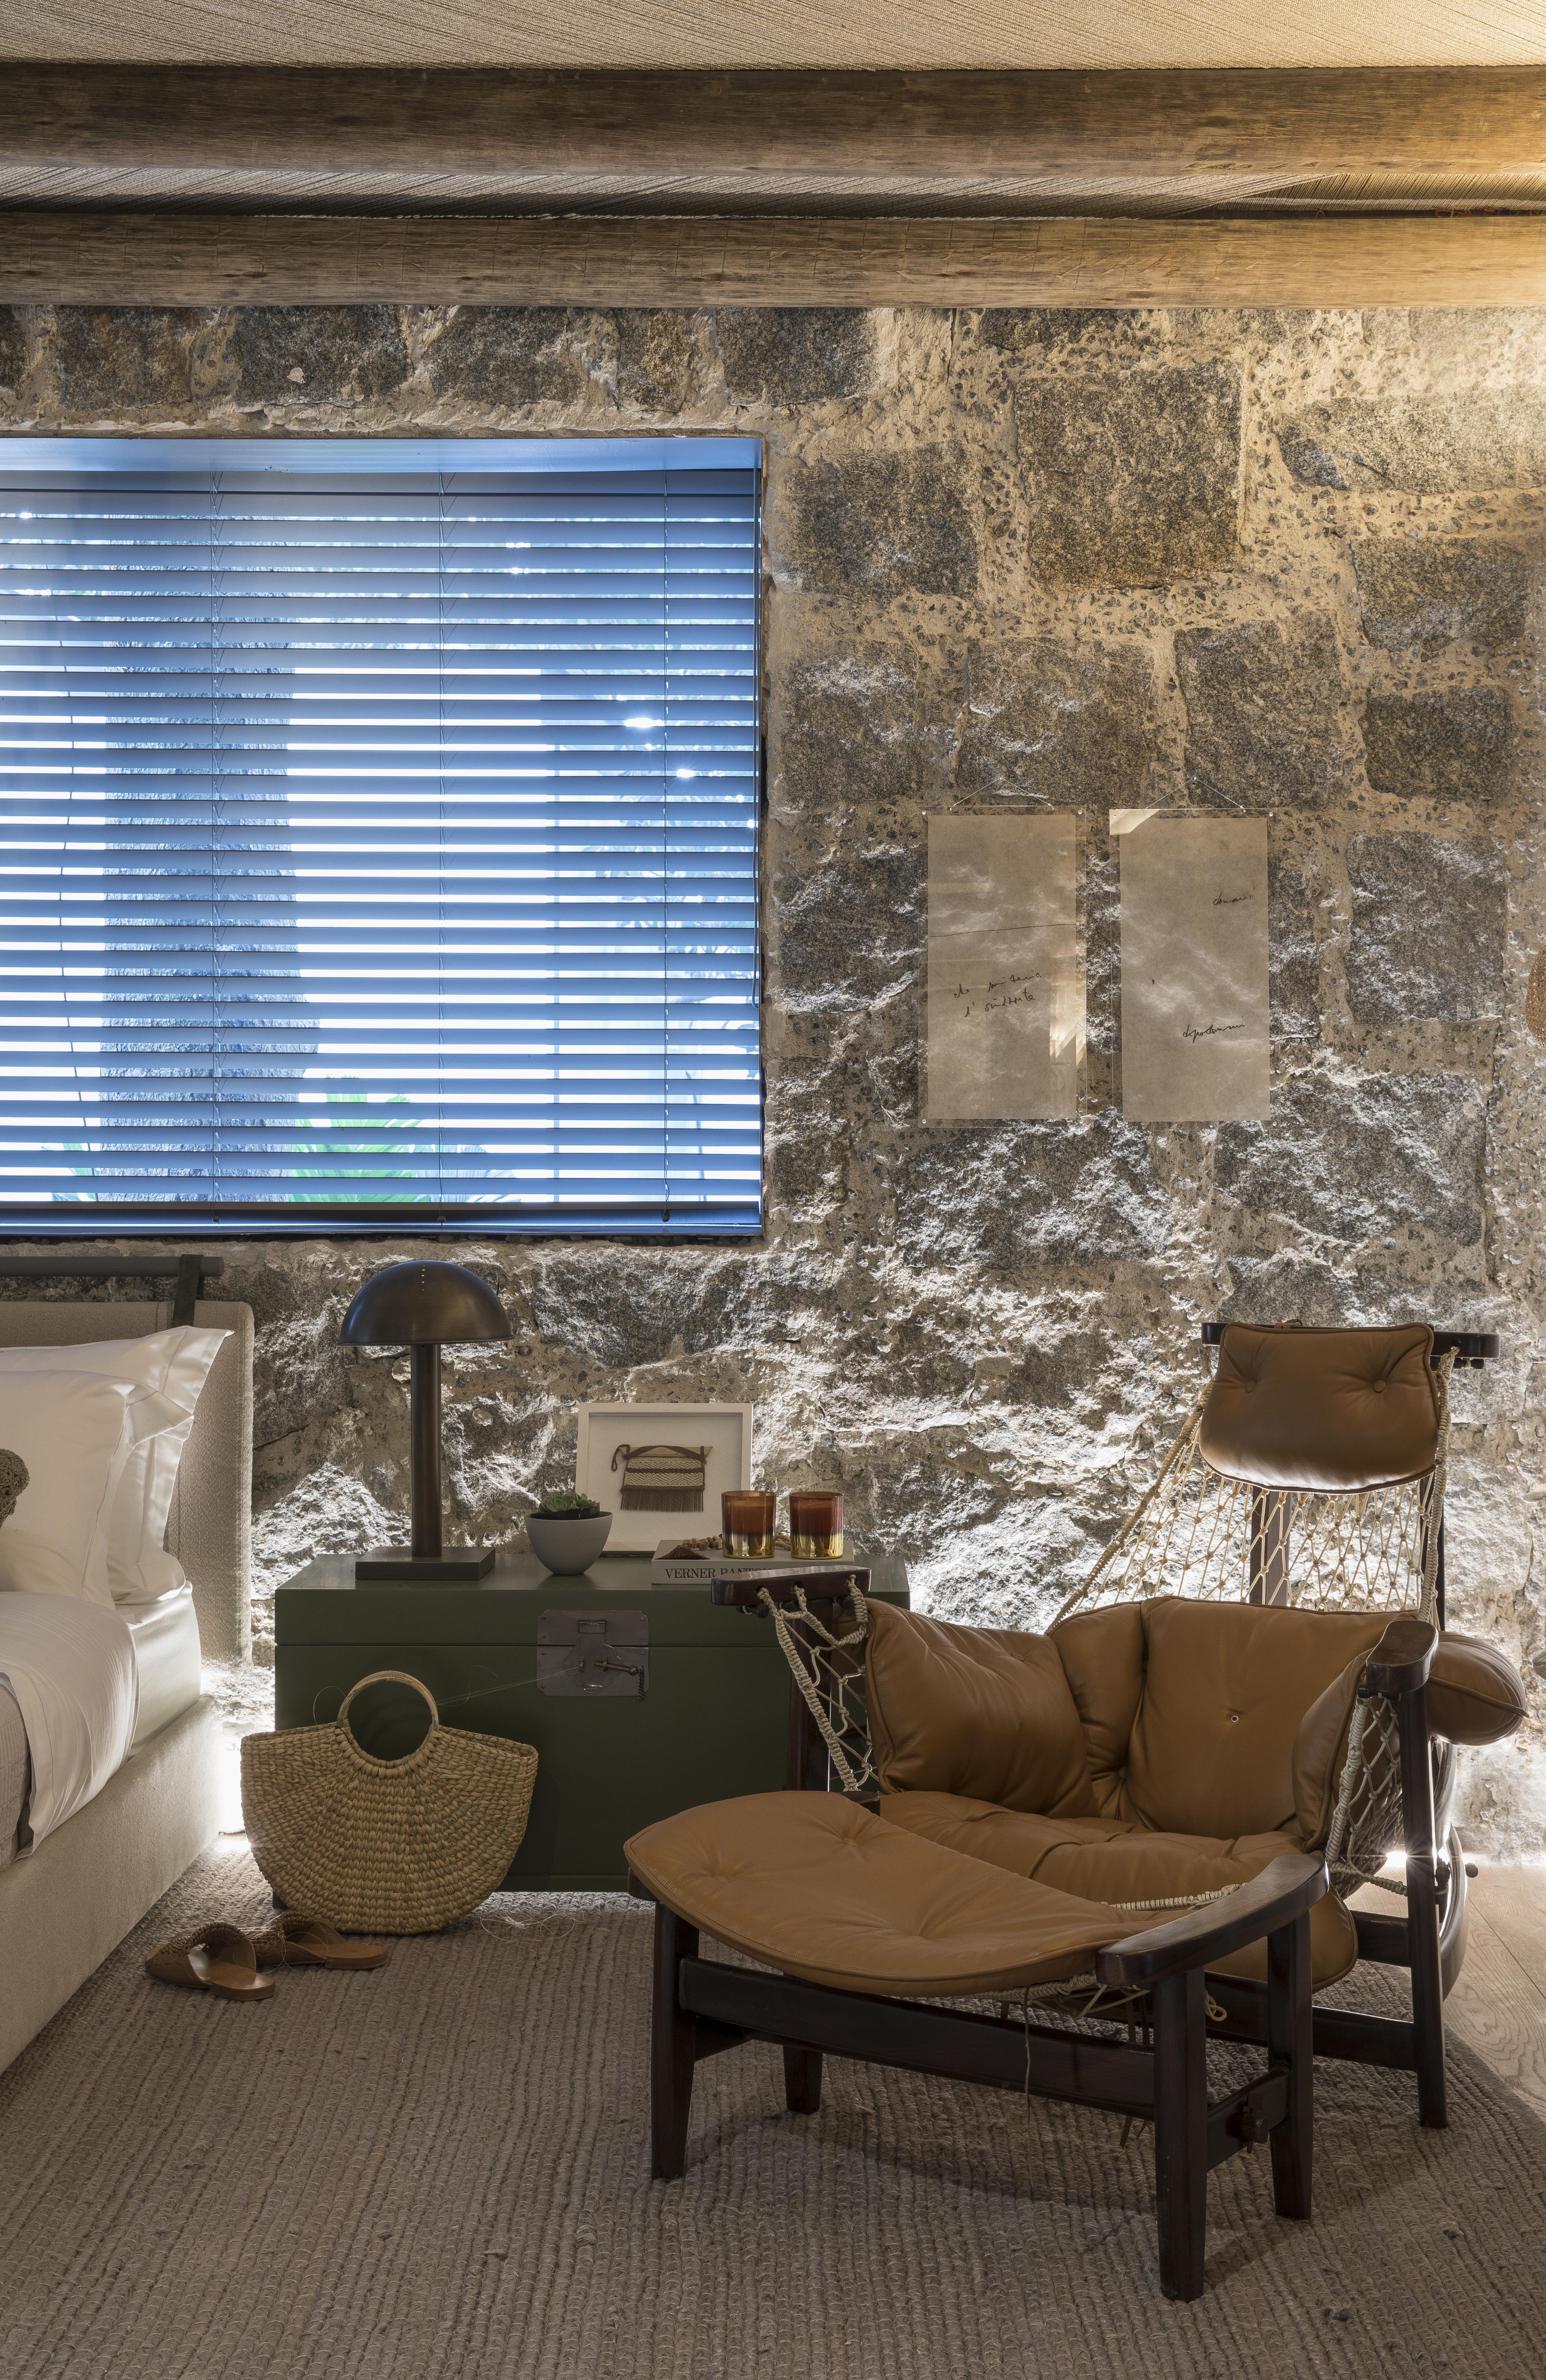 casacor arquitetura triplex são paulo casa raízes pedra paredes